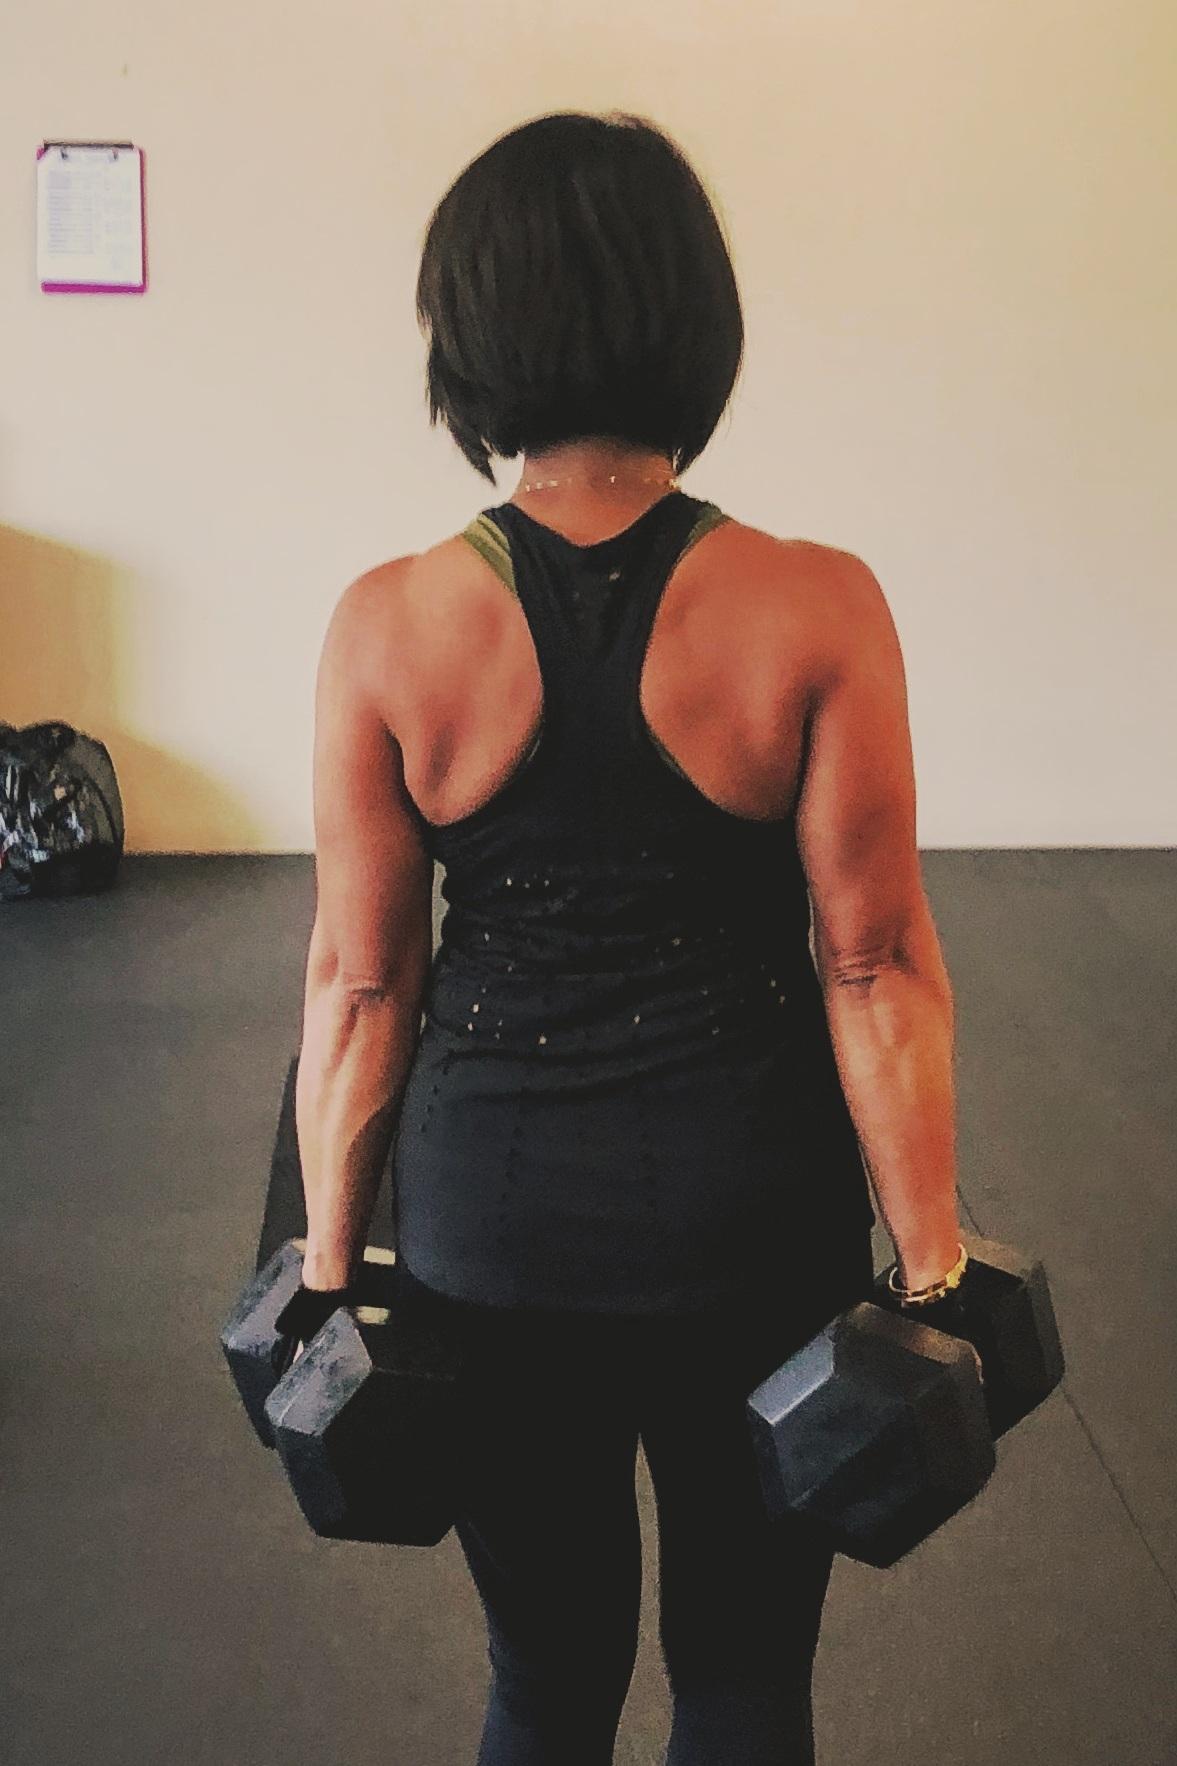 Strength feels good - 30 day money back guarantee